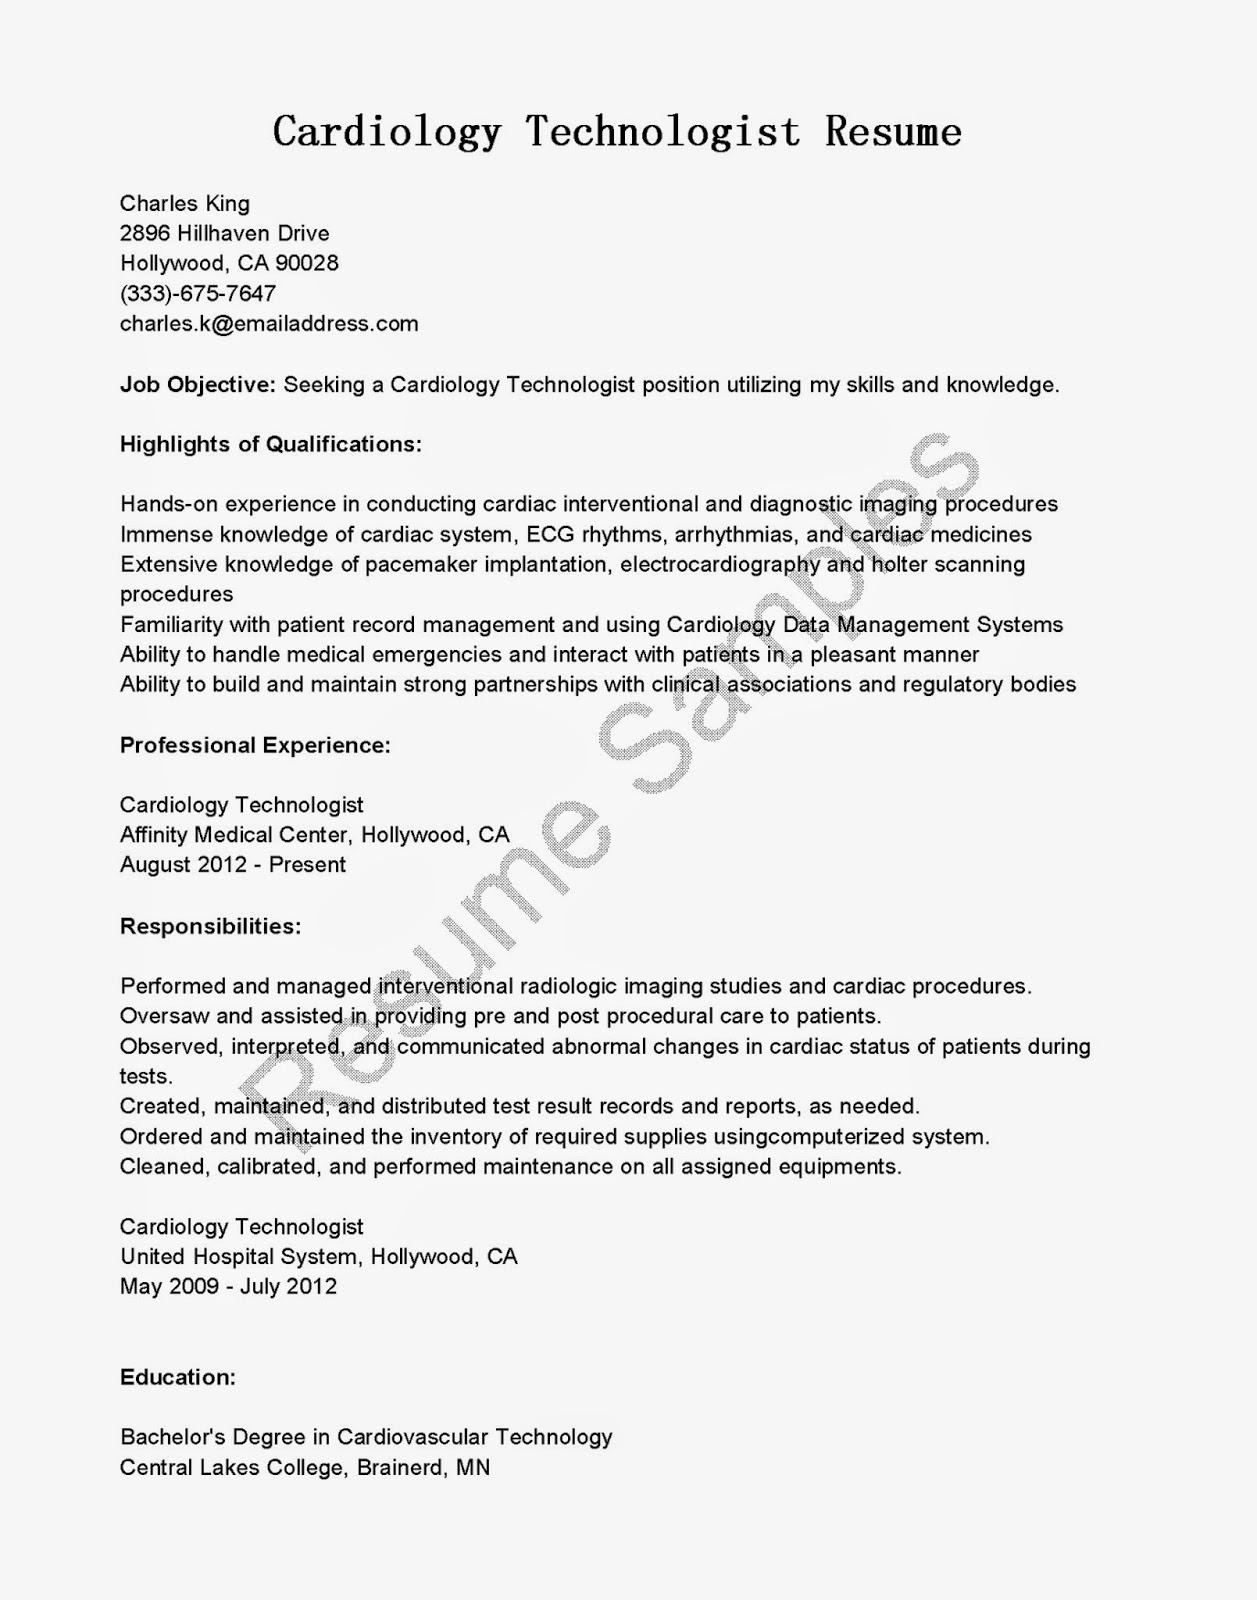 Resume Samples Cardiology Technologist Resume Sample